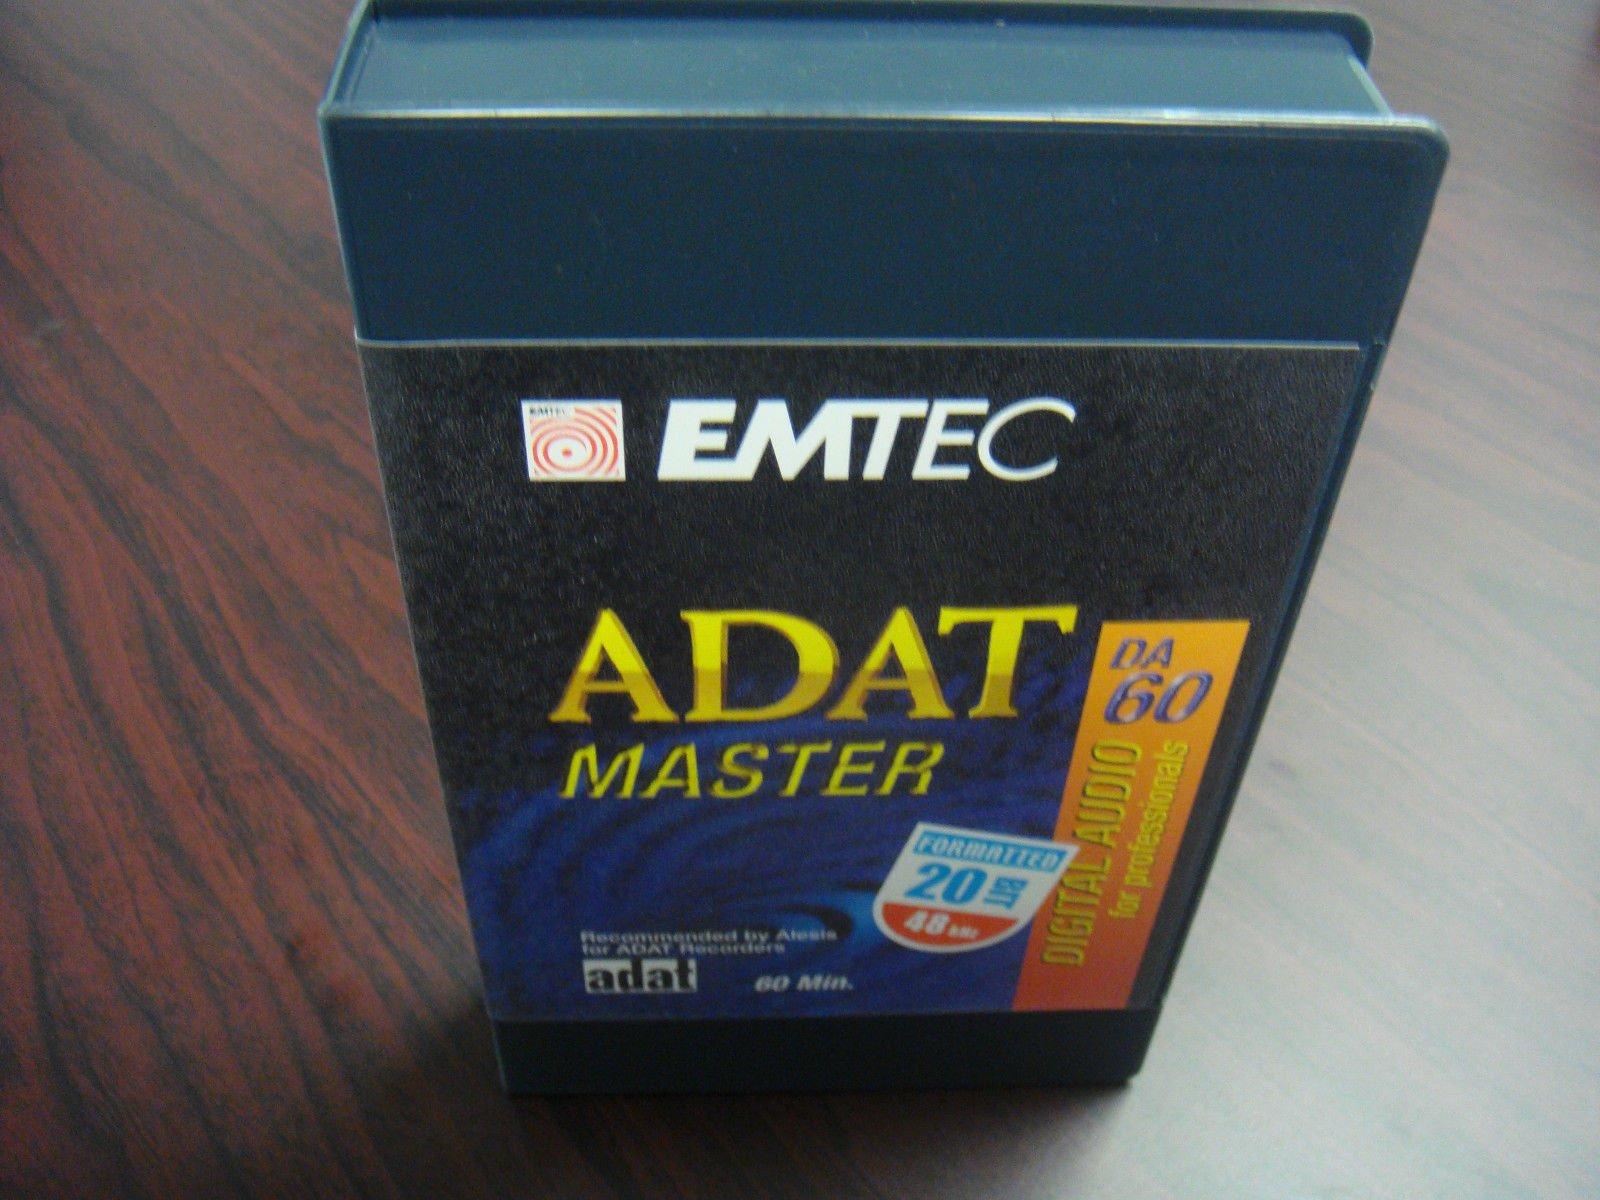 BASF 60-Minute *20 BIT FORMATTED Blank ADAT Tape in Case by BASF (Image #1)